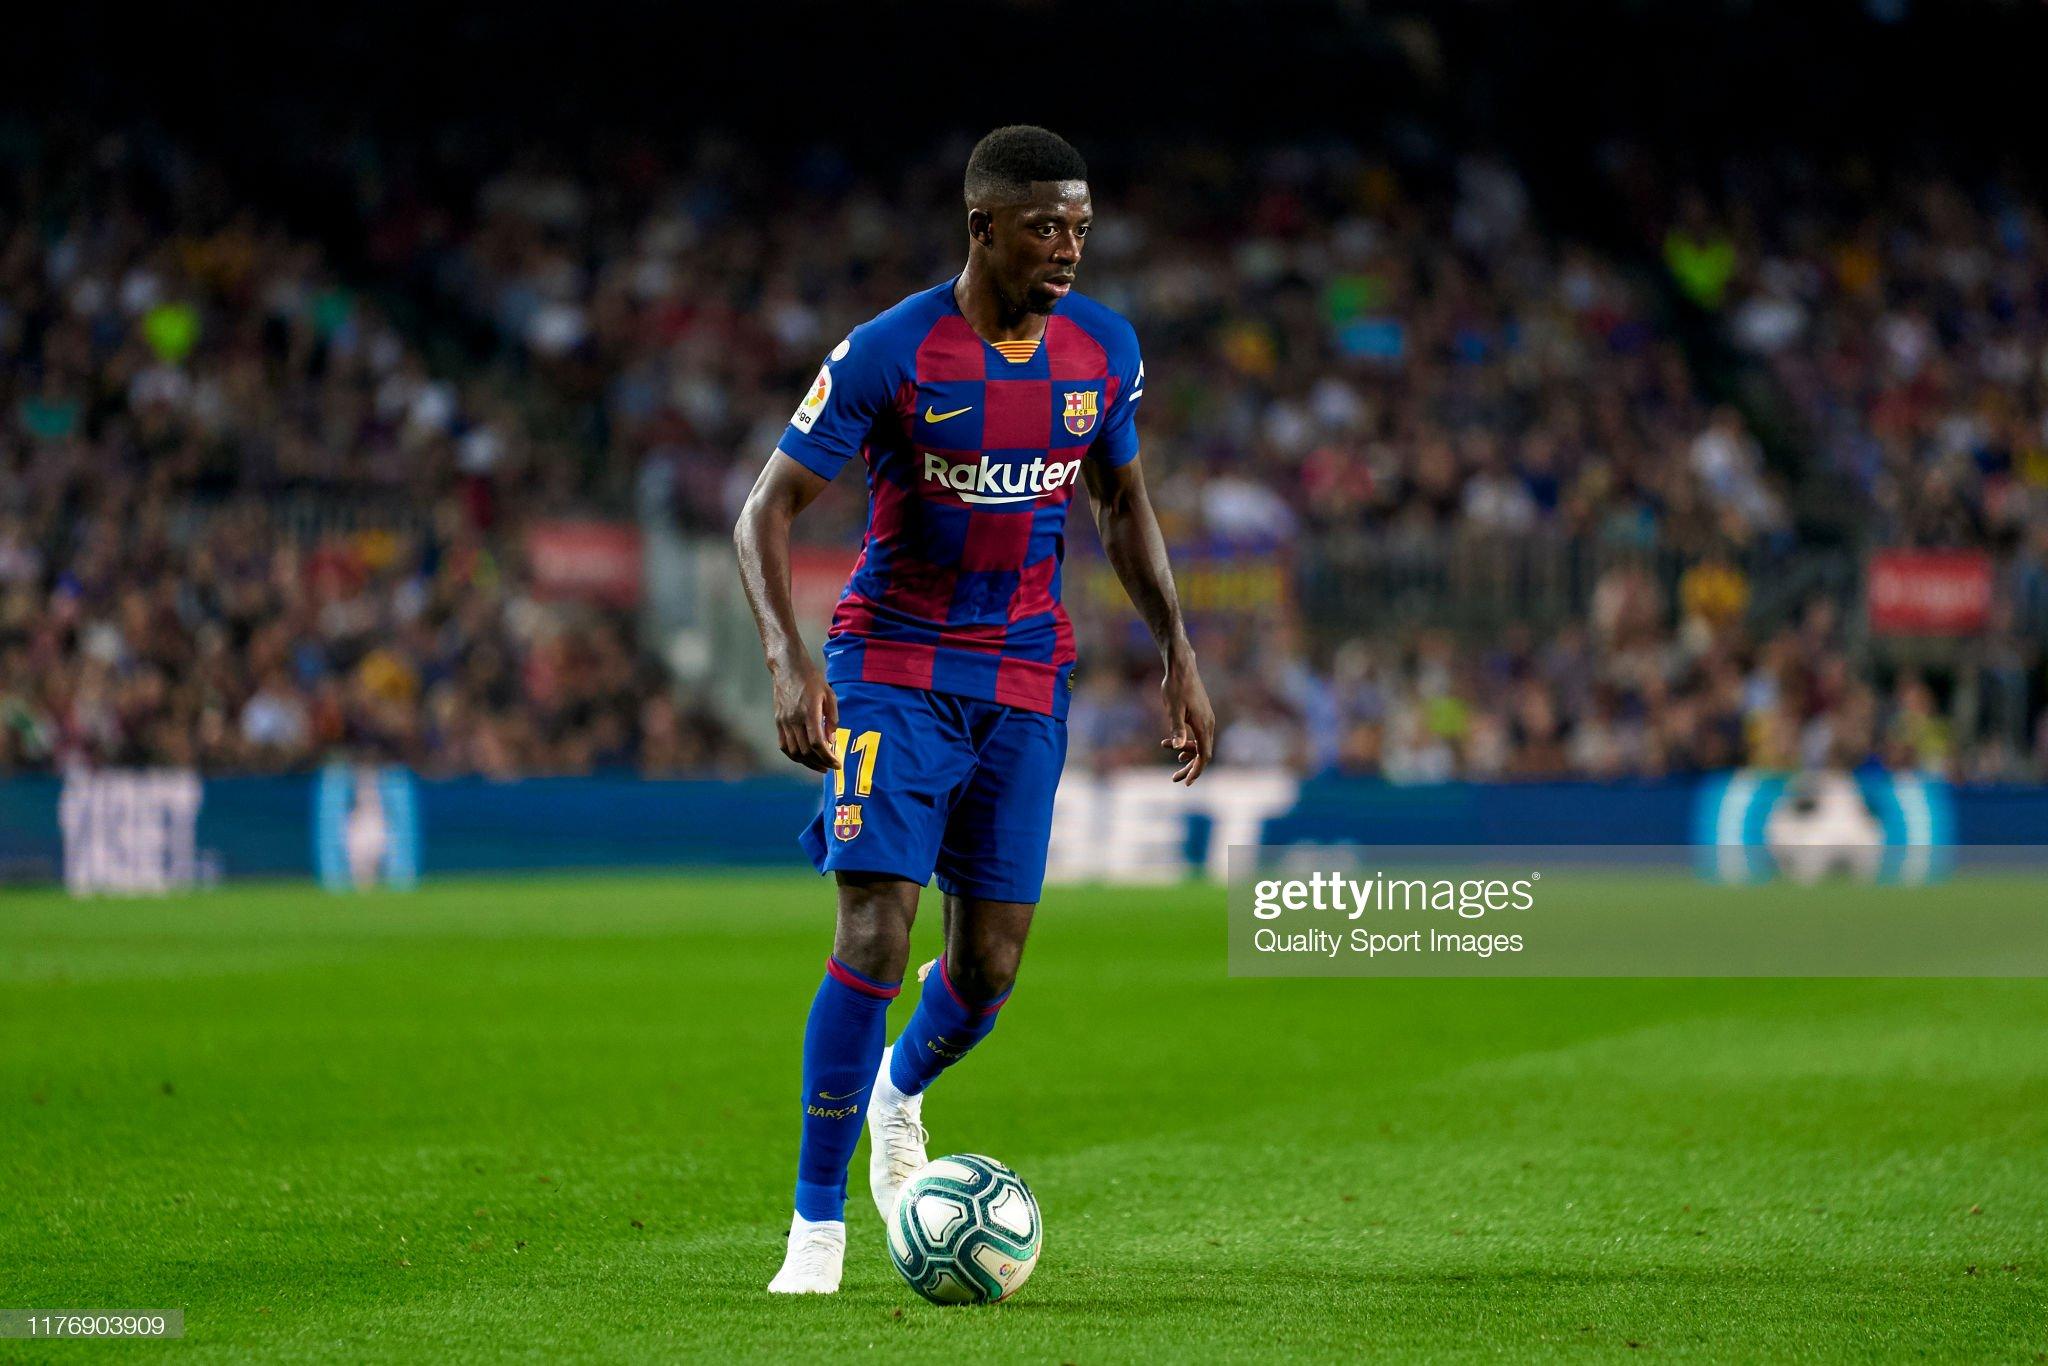 صور مباراة : برشلونة - فياريال 2-1 ( 24-09-2019 )  Ousmane-dembele-of-fc-barcelona-with-the-ball-during-the-liga-match-picture-id1176903909?s=2048x2048